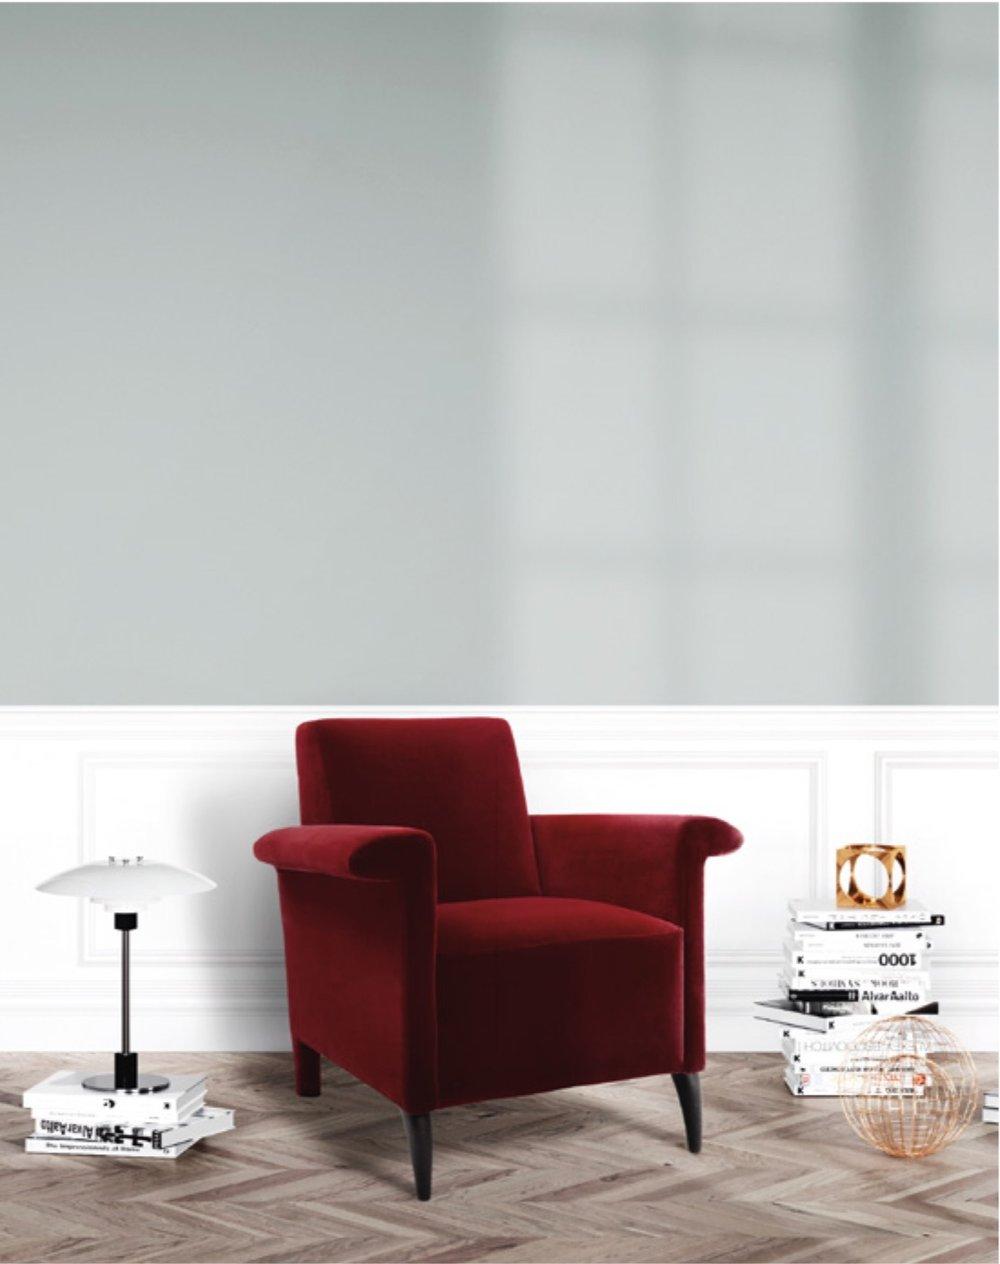 AMC 107 Italian Designer Lounge Chairs